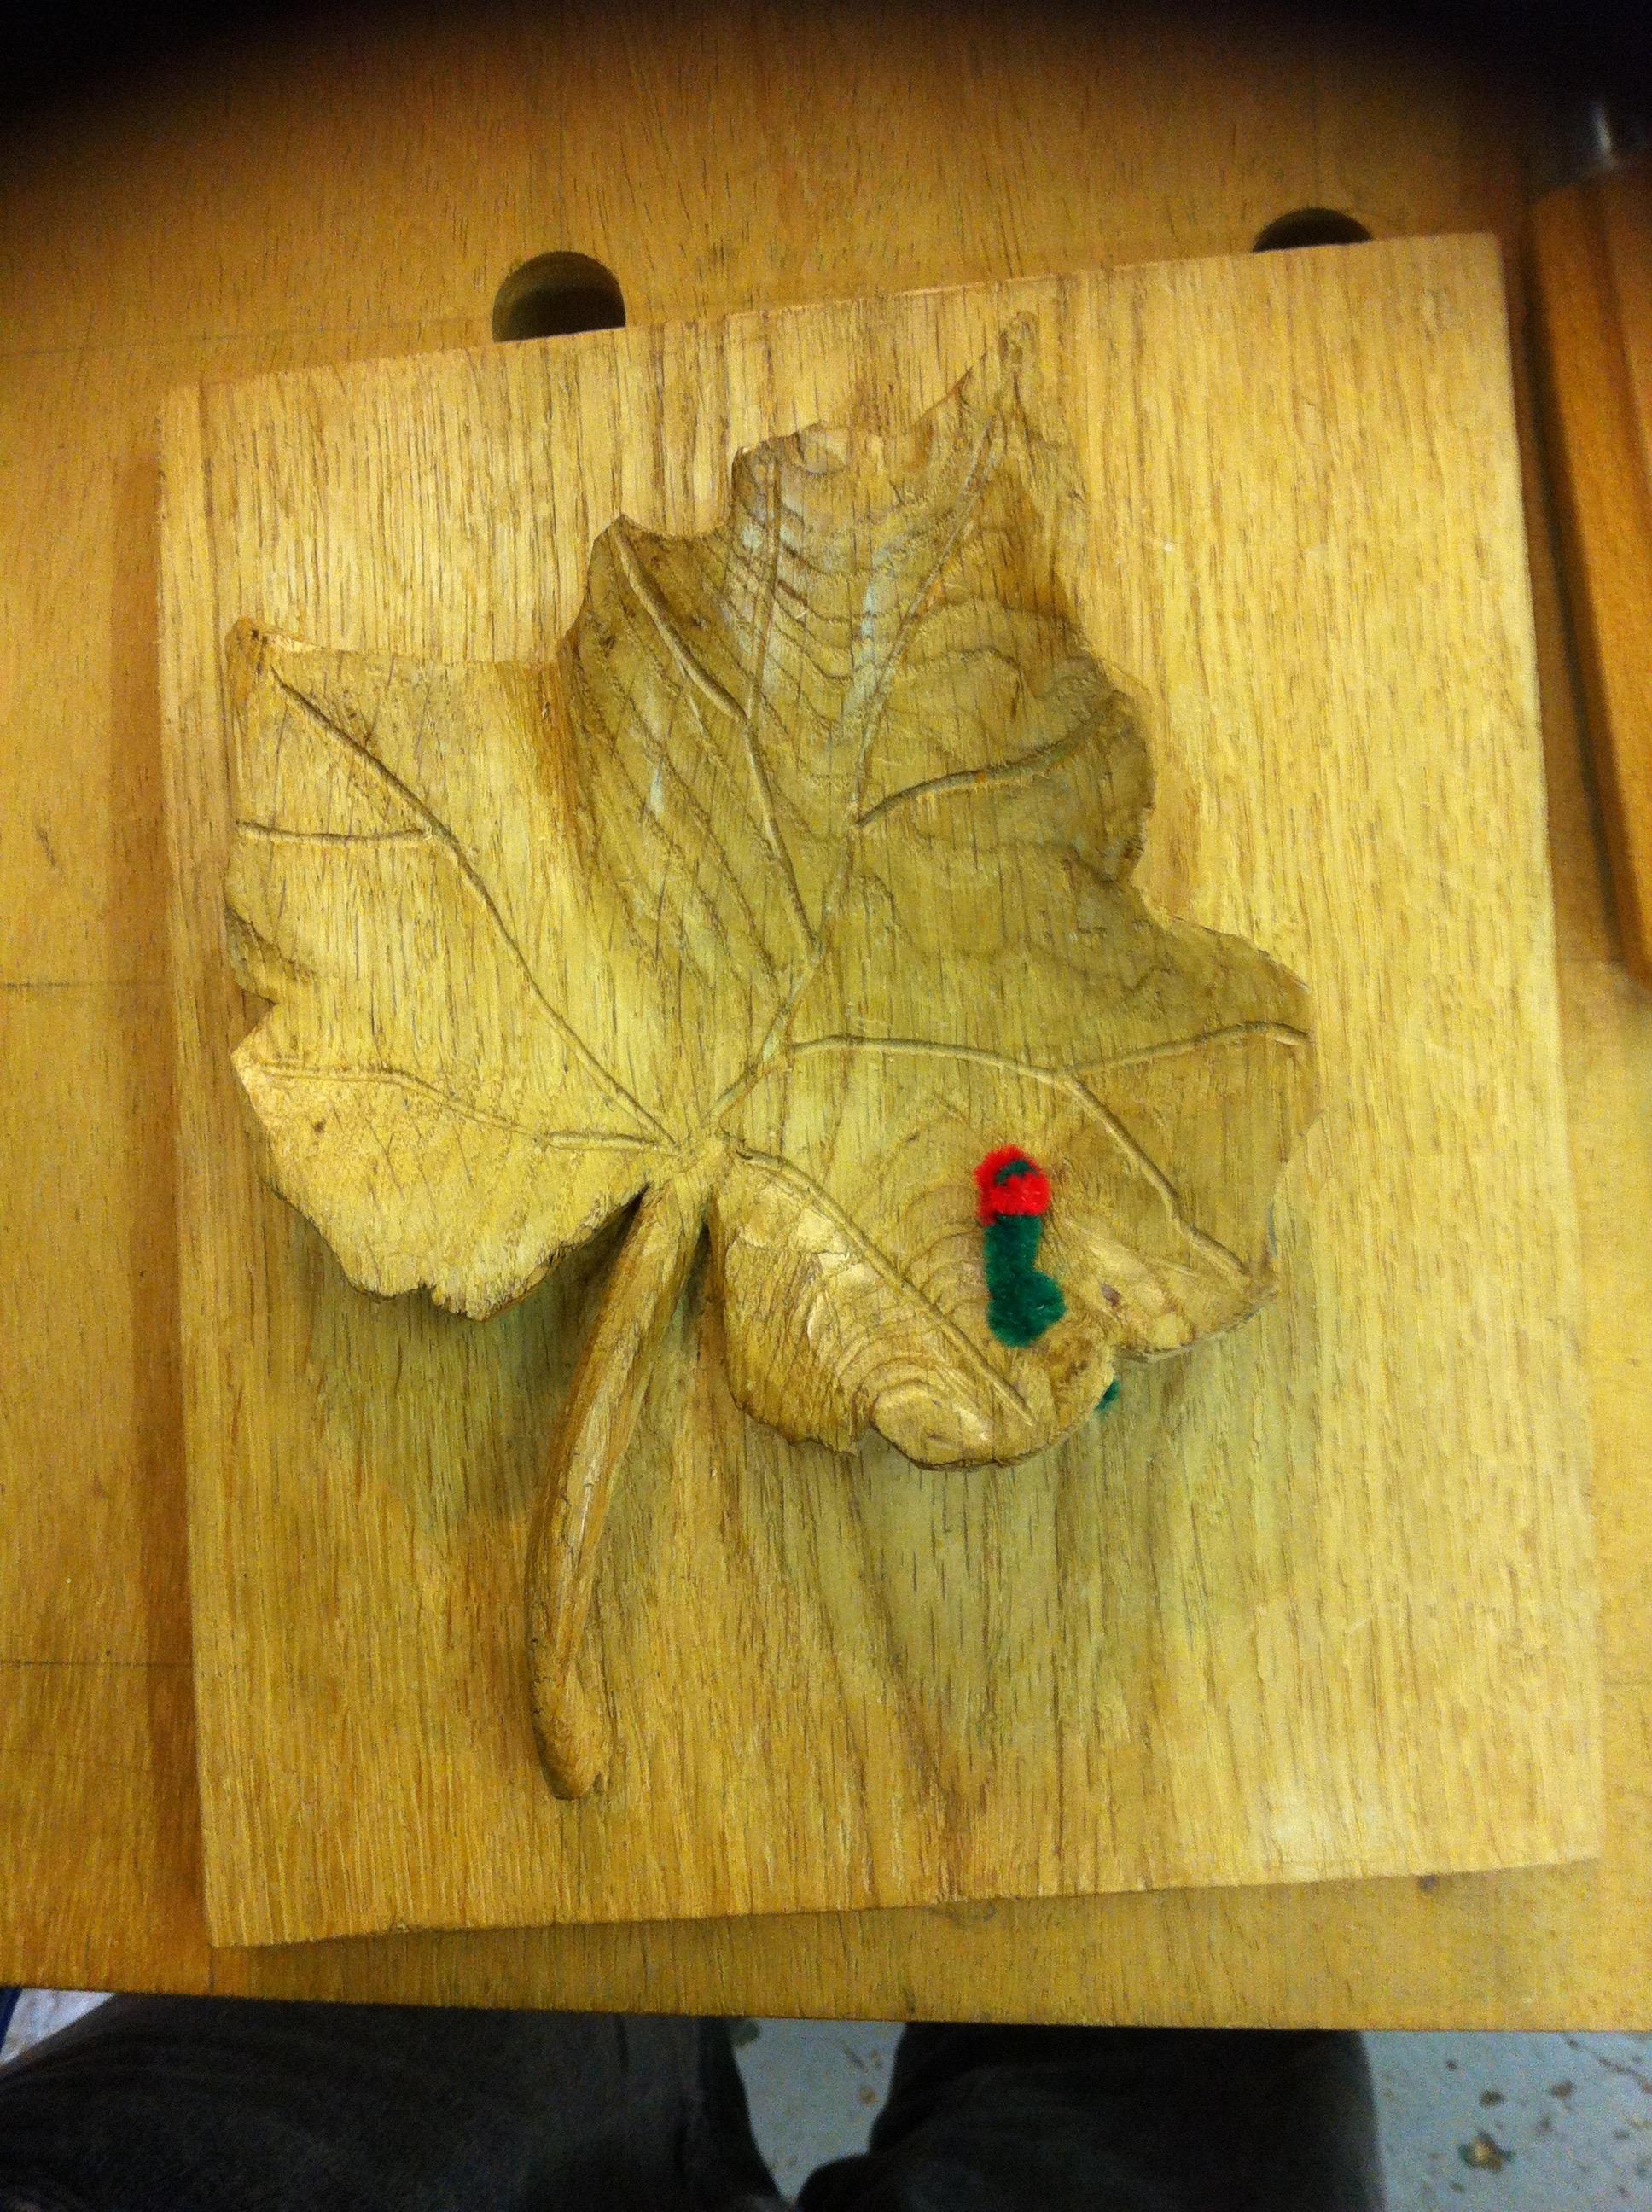 Wood Carving Thursday Evenings Autumn 2020